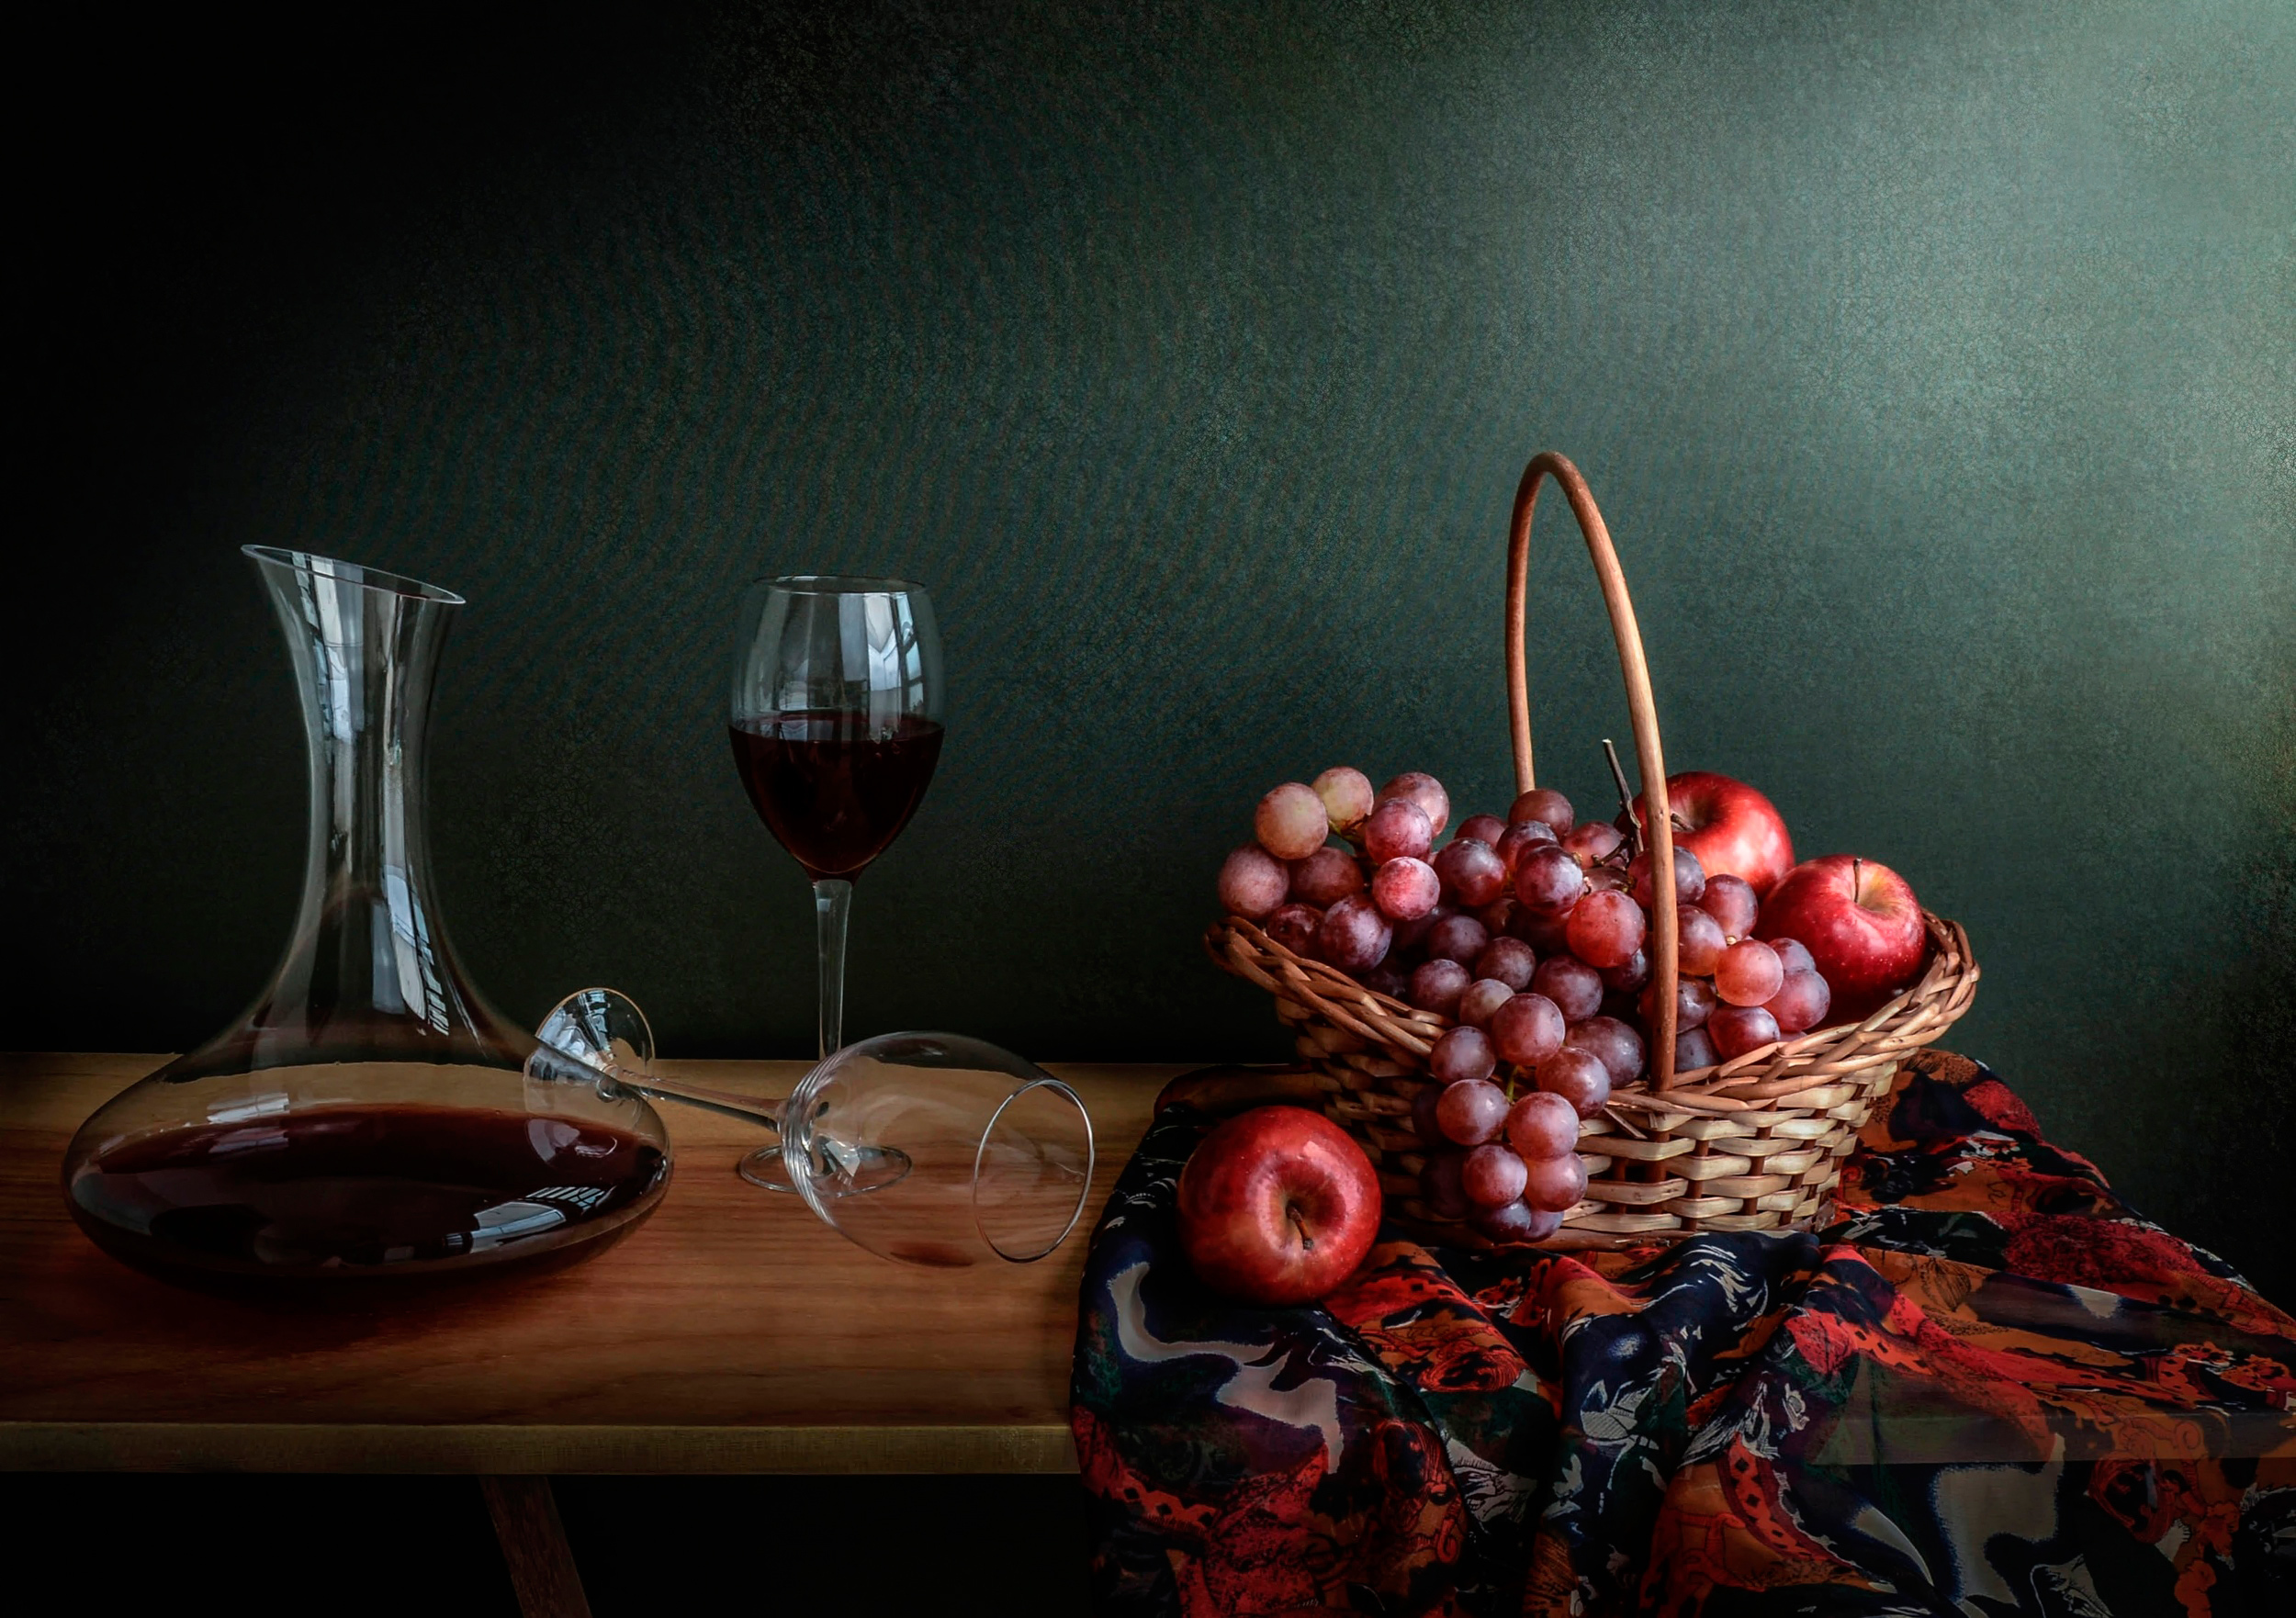 бокал вино корзина сирень  № 3966458 бесплатно